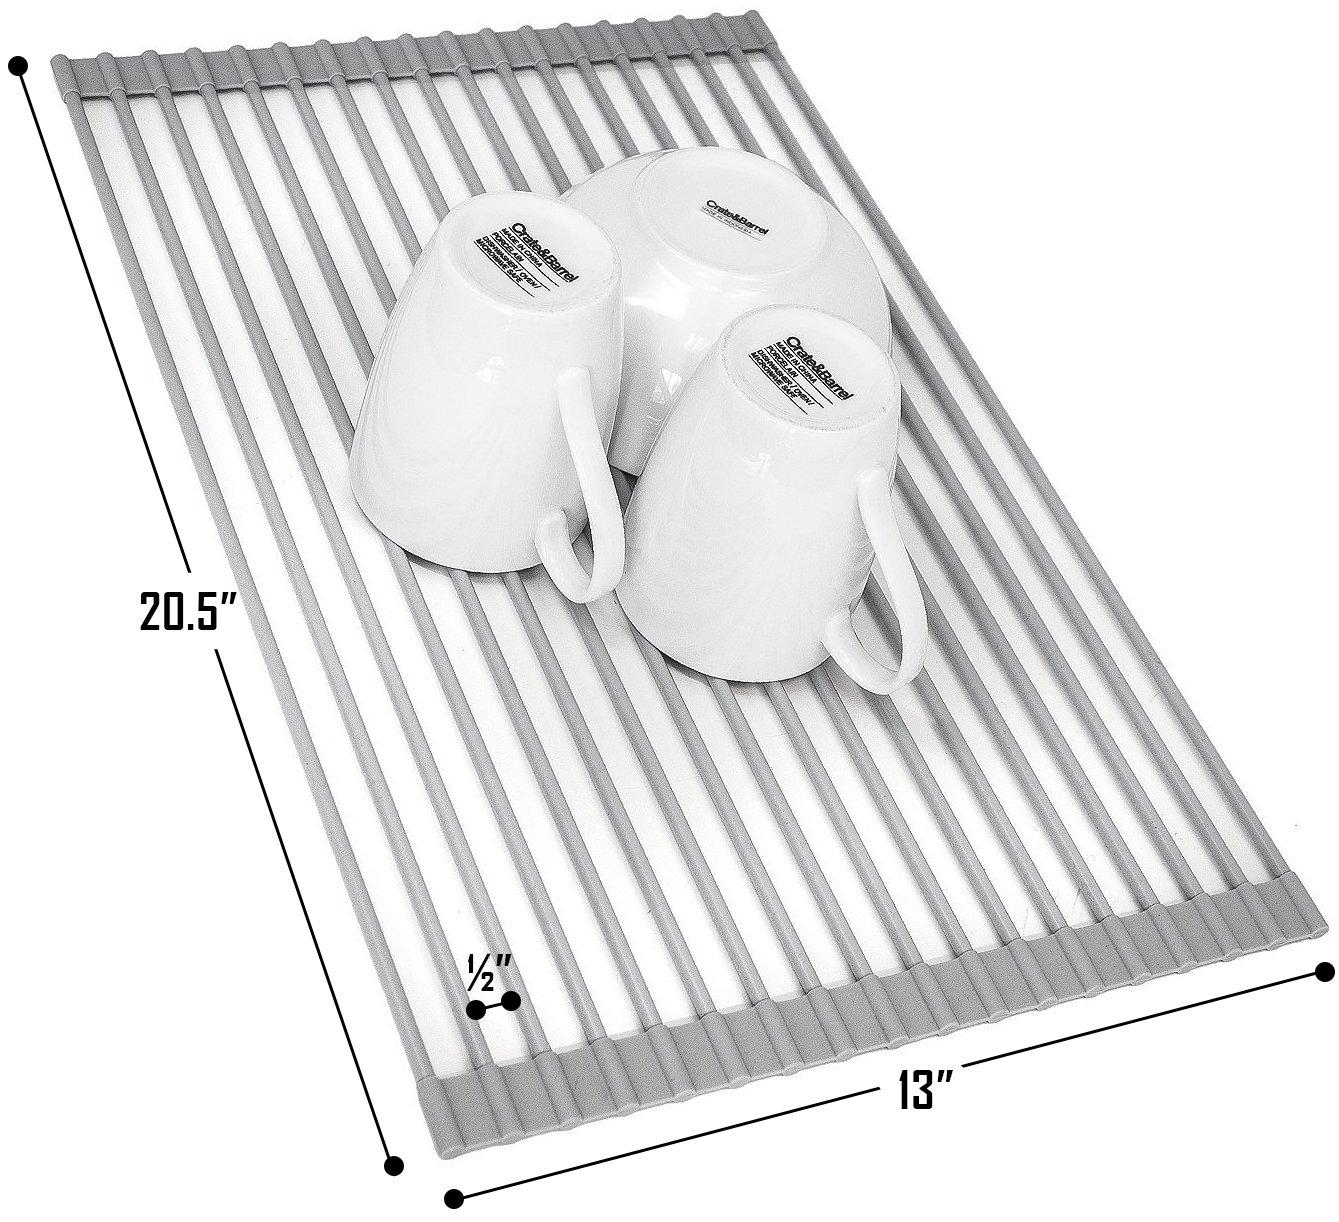 Sorbus DR-RACKRU Roll-Up Dish Drying Rack Warm Gray